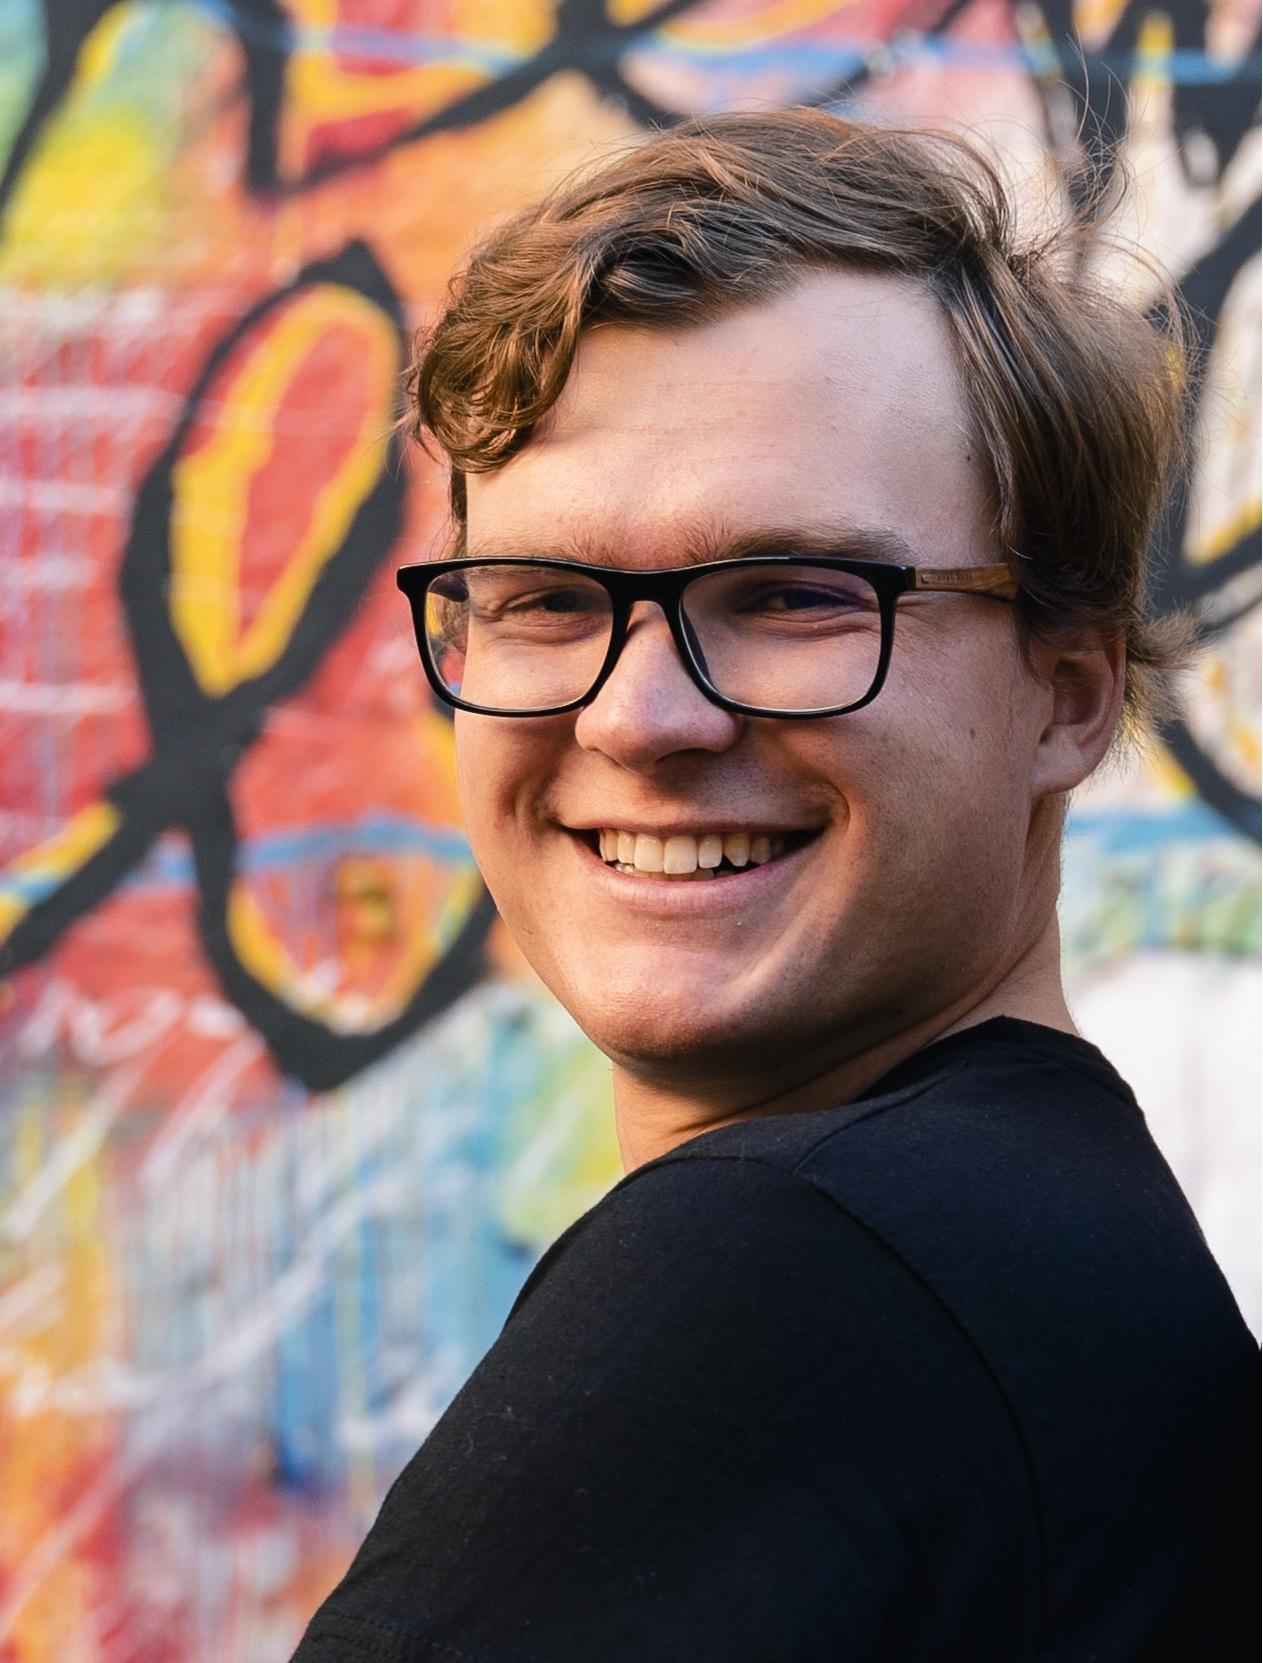 Studium očima studenta: rozhovor s Davidem Makovským